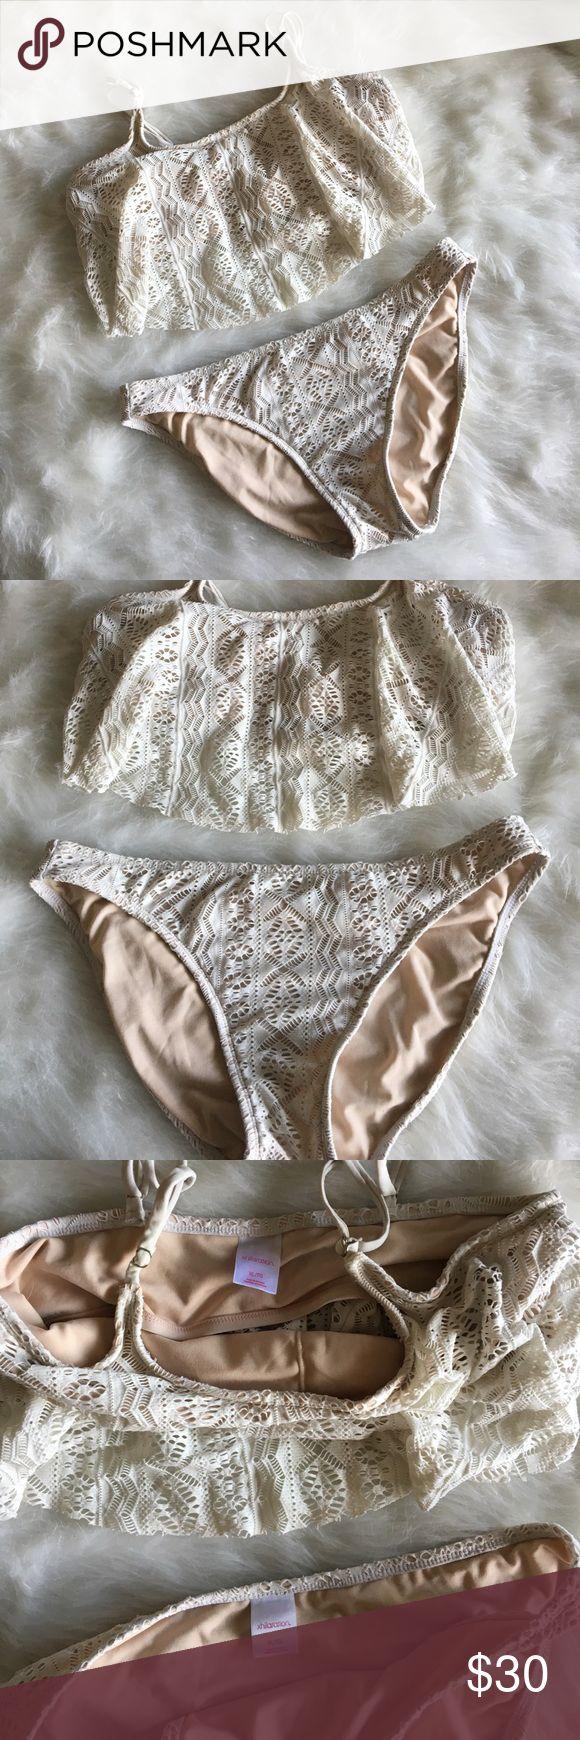 Cream lace bikini set Off white lace bikini set with ruffle top! Nude underlying lining. Top has adjustable straps. See photos for measurements Xhilaration Swim Bikinis